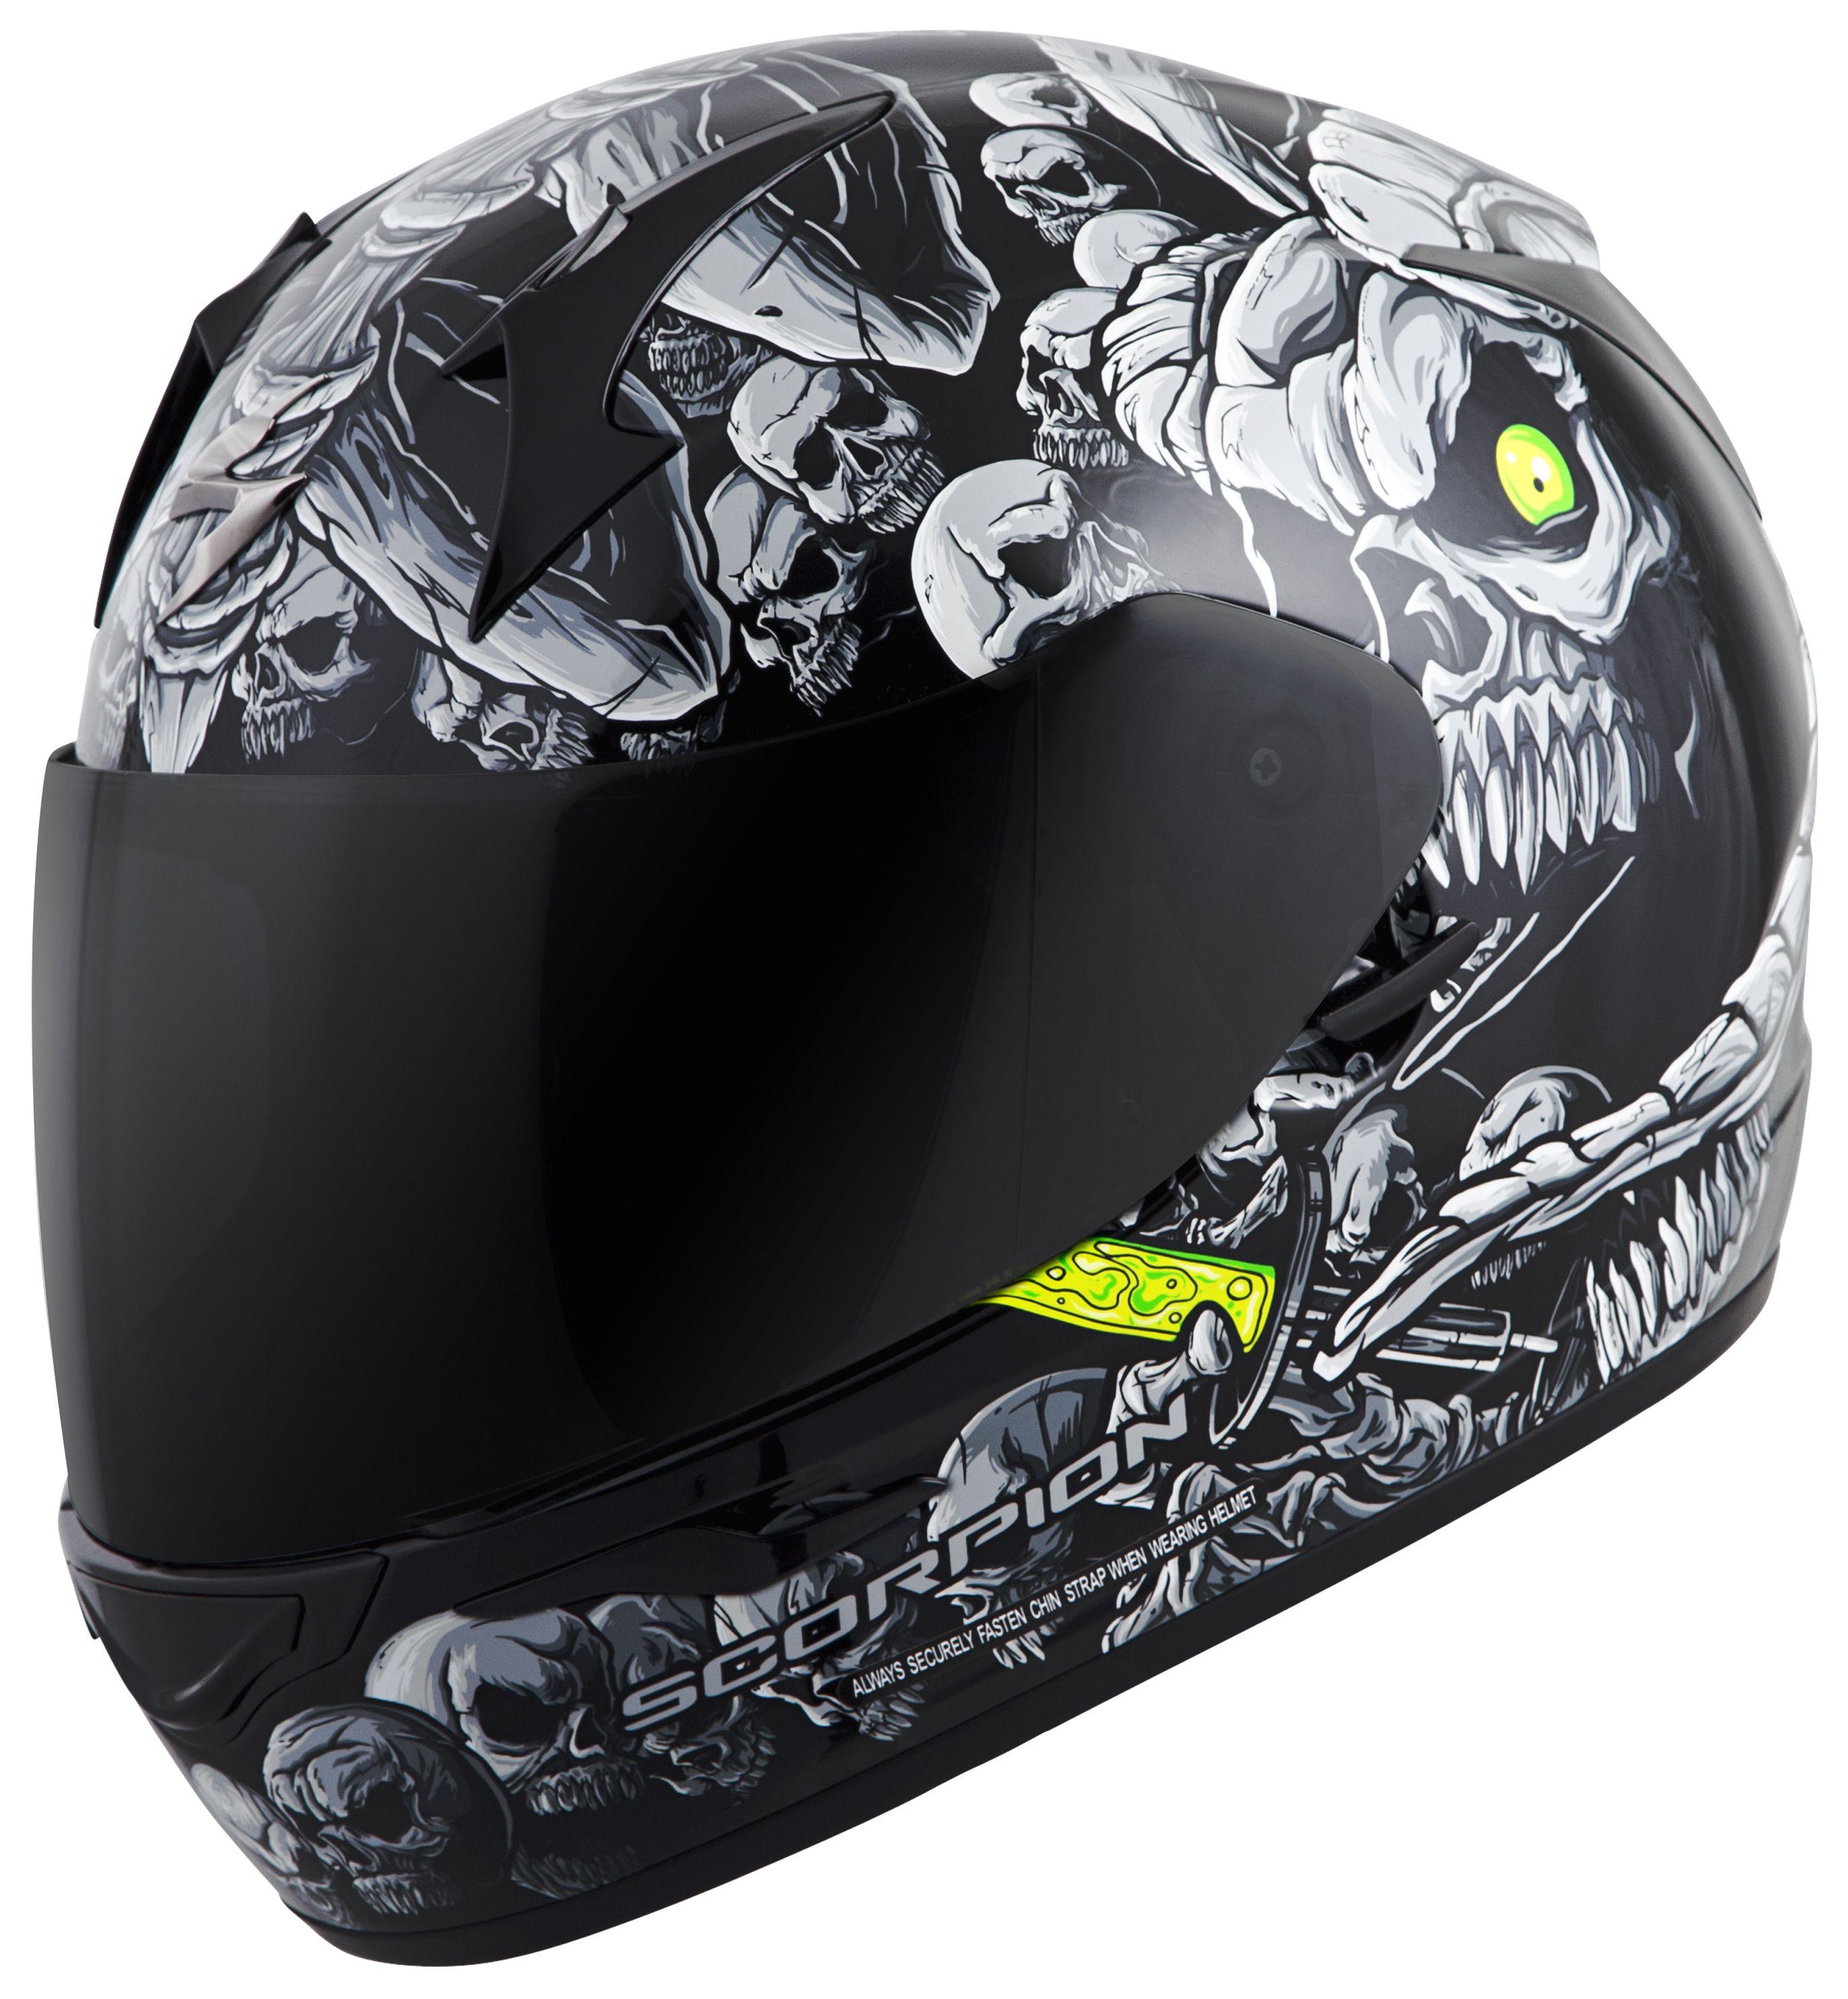 Scorpion EXO-R410 Dr. Sin Motorcycle Helmet - 90$ -  DOT & Snell M2015 - FS - No Tax in CA $90